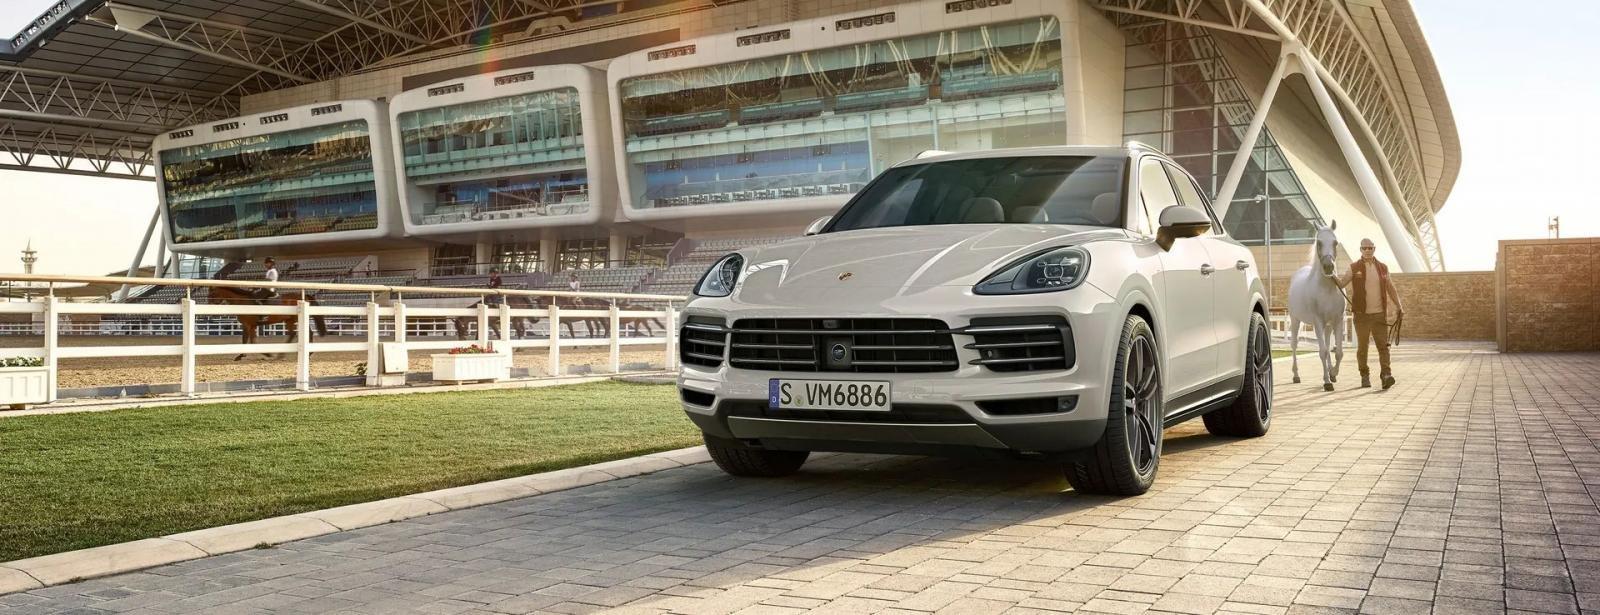 Giá xe Porsche Cayenne.